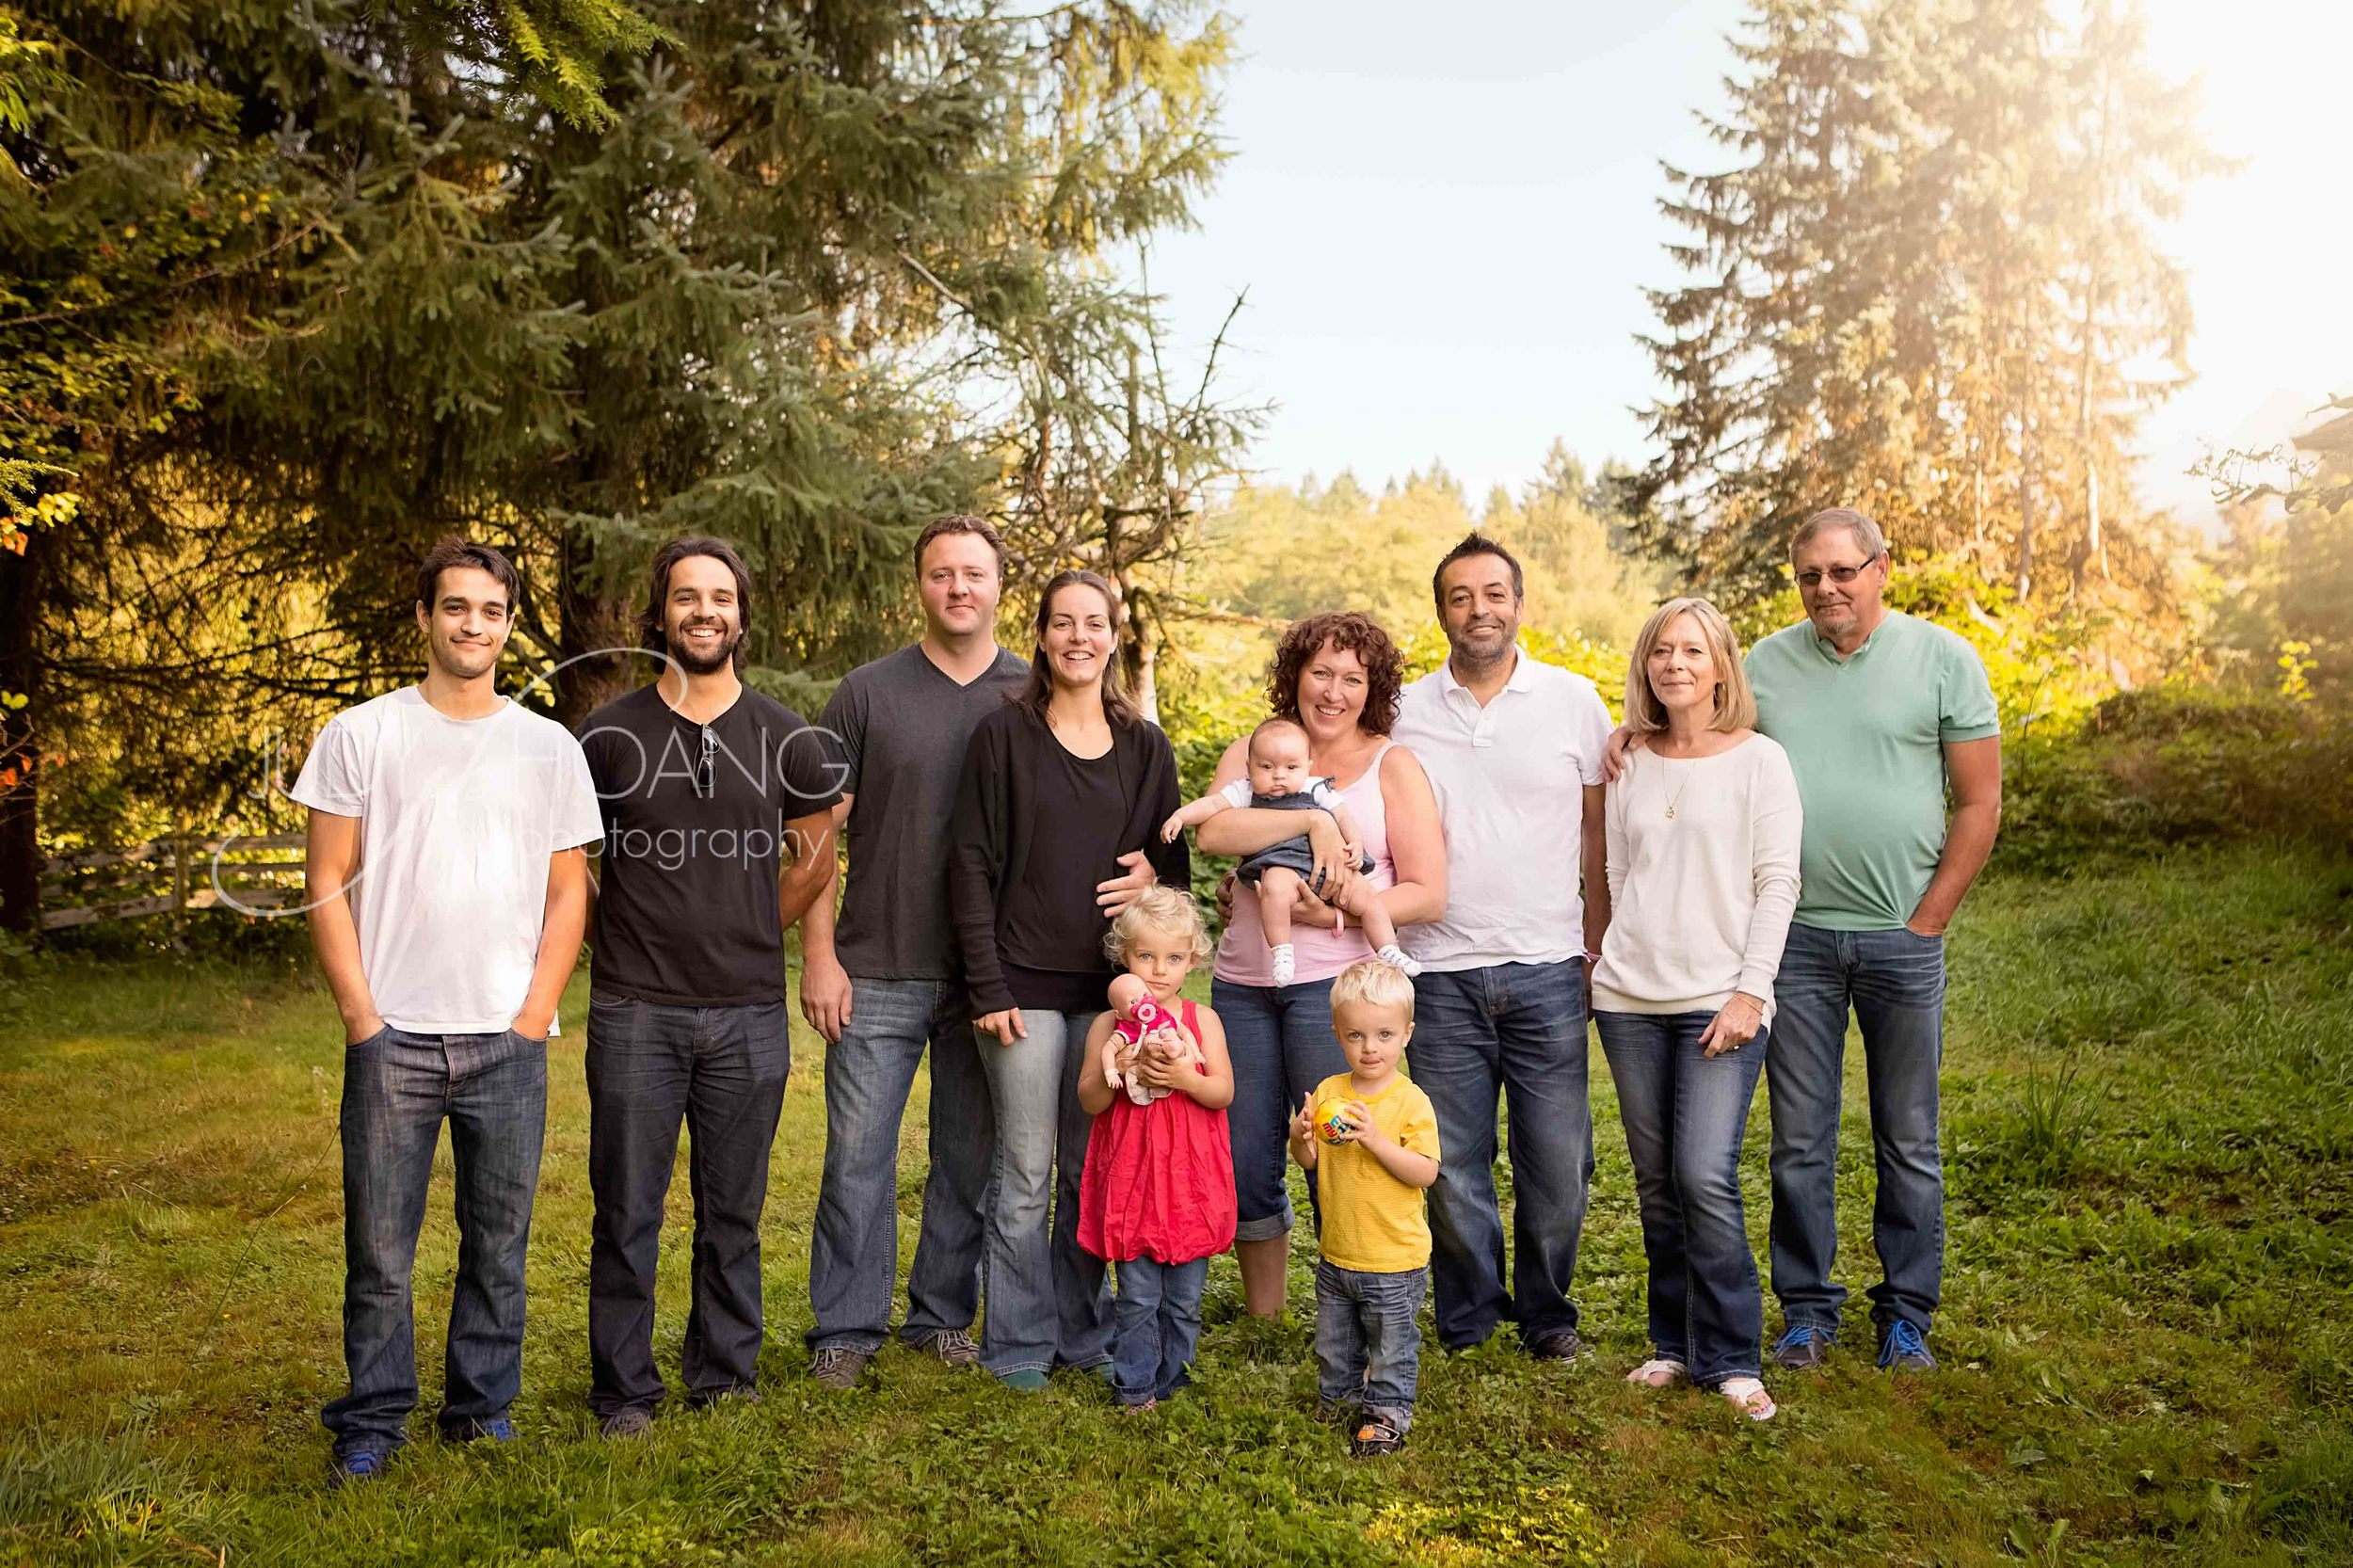 Judy Hoang Photography - Helen and Jorge Family-1.JPG